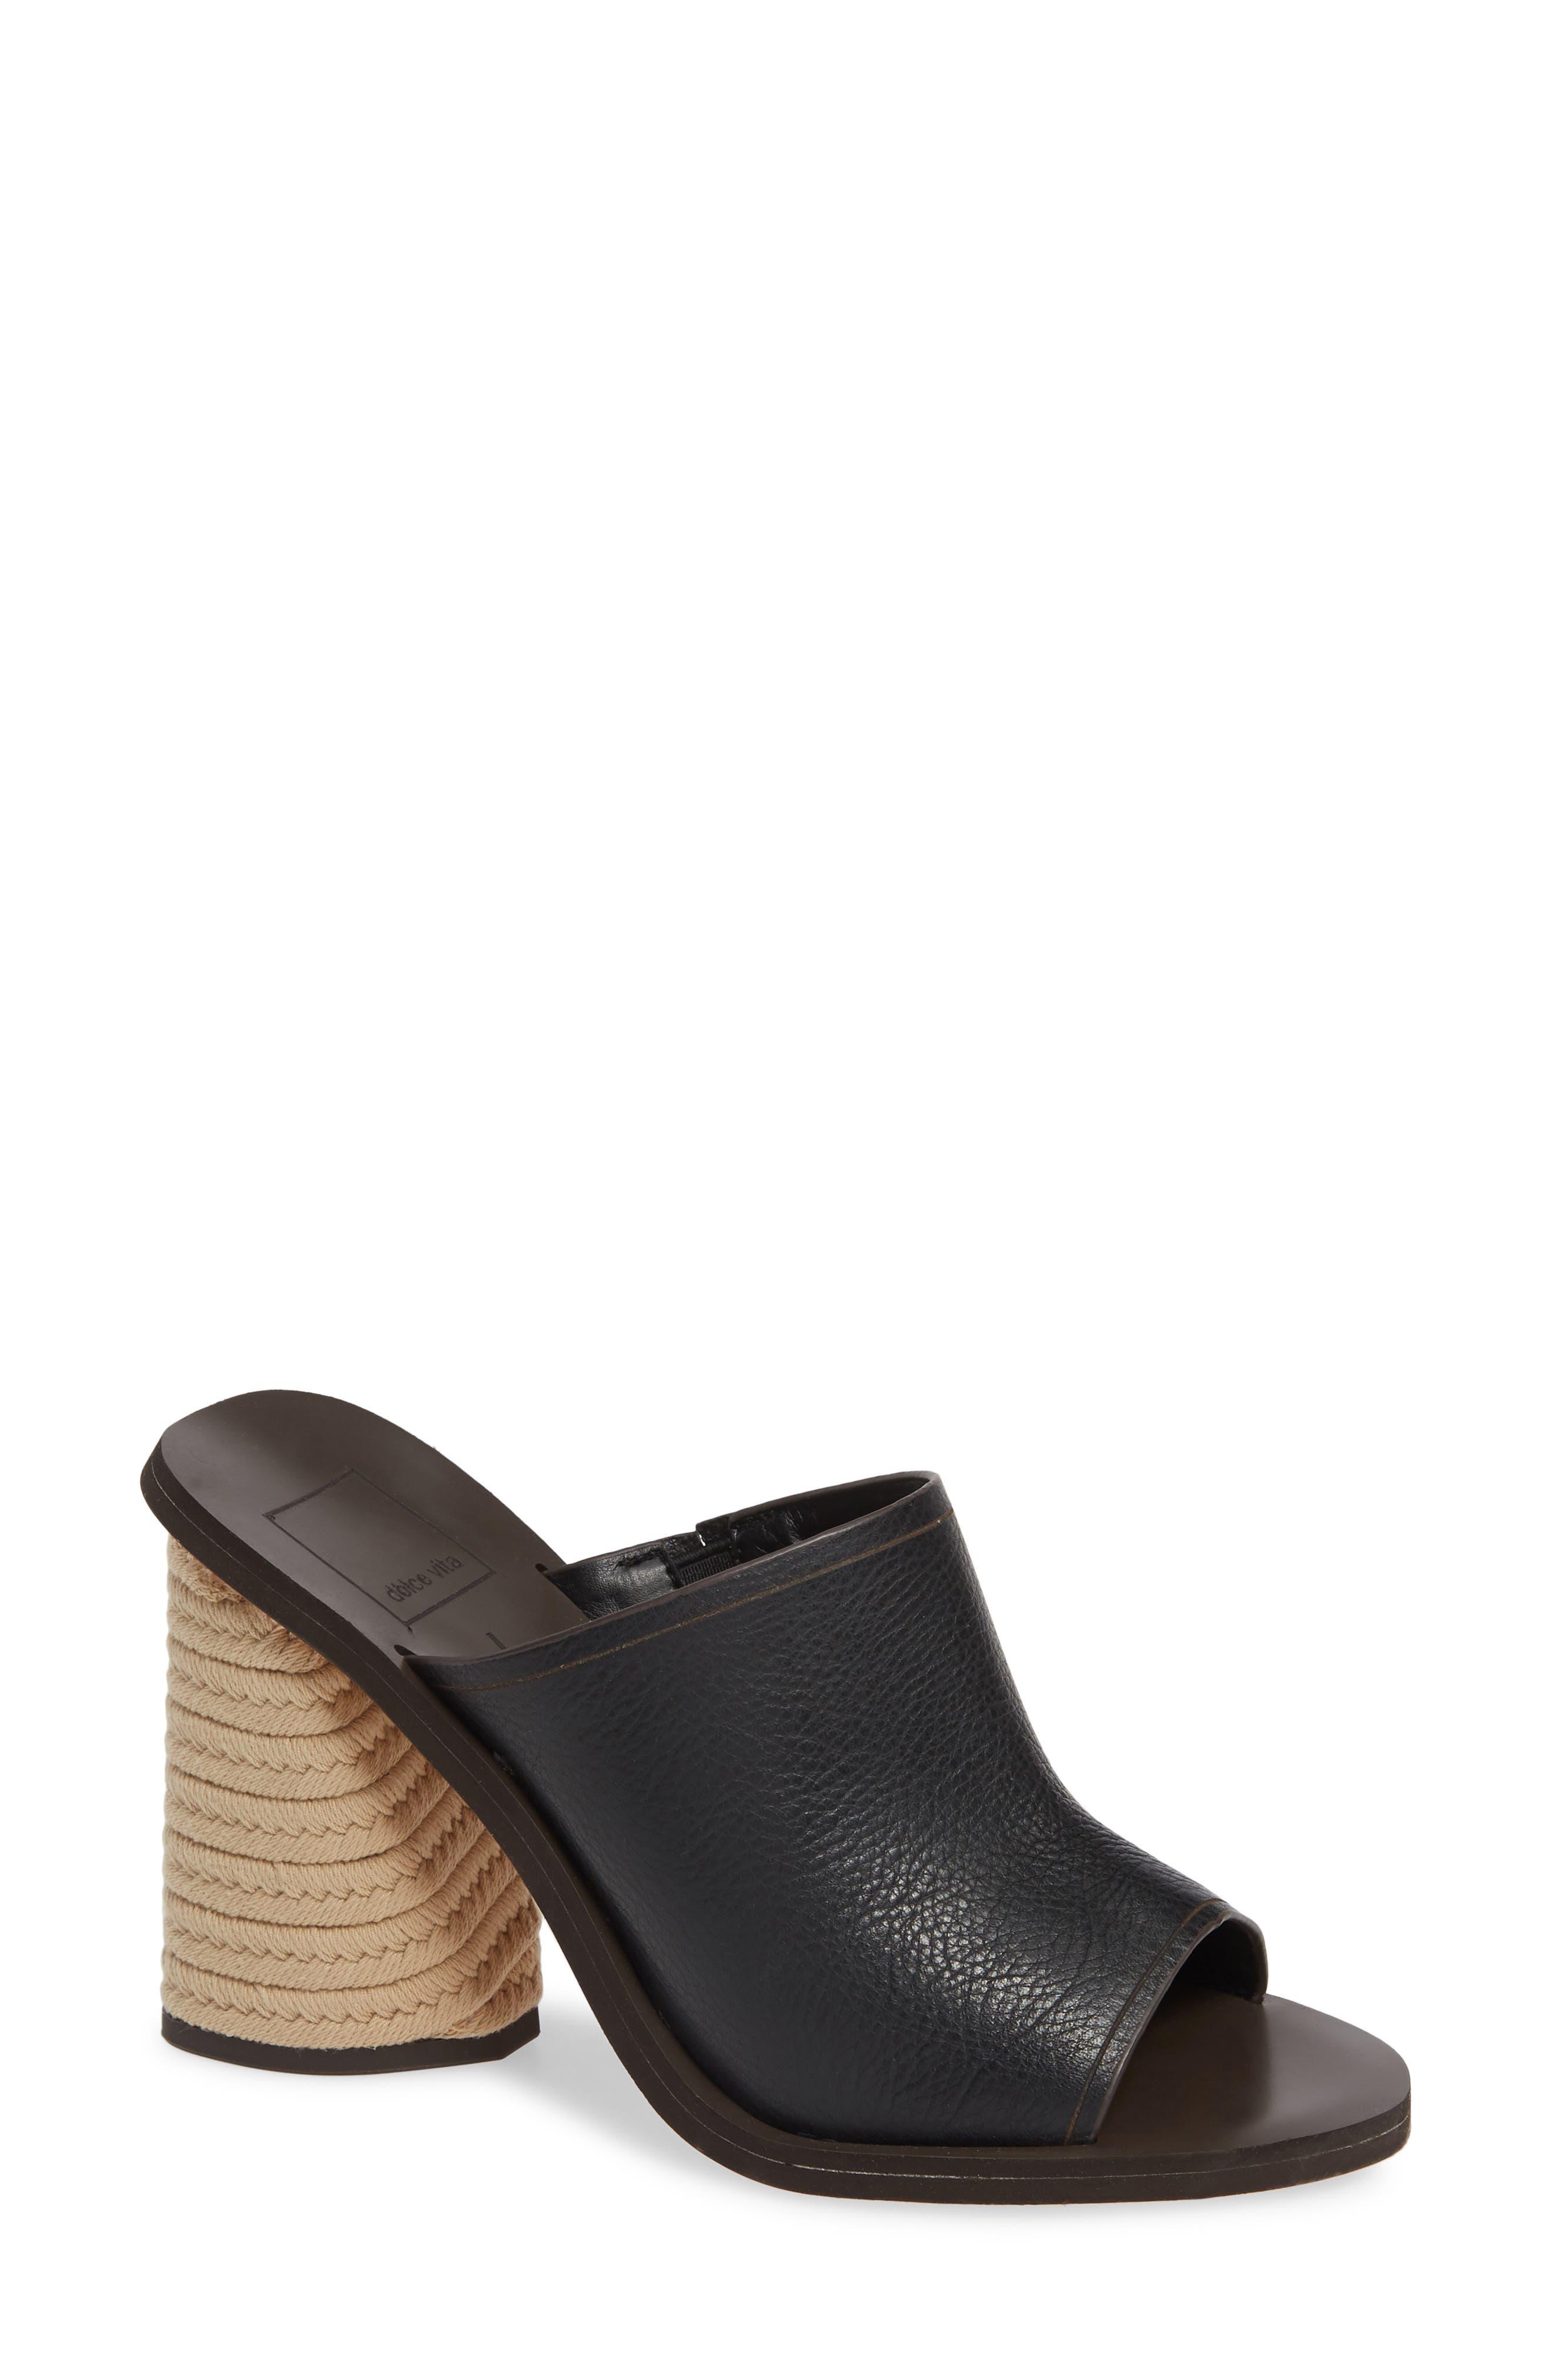 DOLCE VITA Alba Braided Heel Mule Sandal, Main, color, BLACK LEATHER